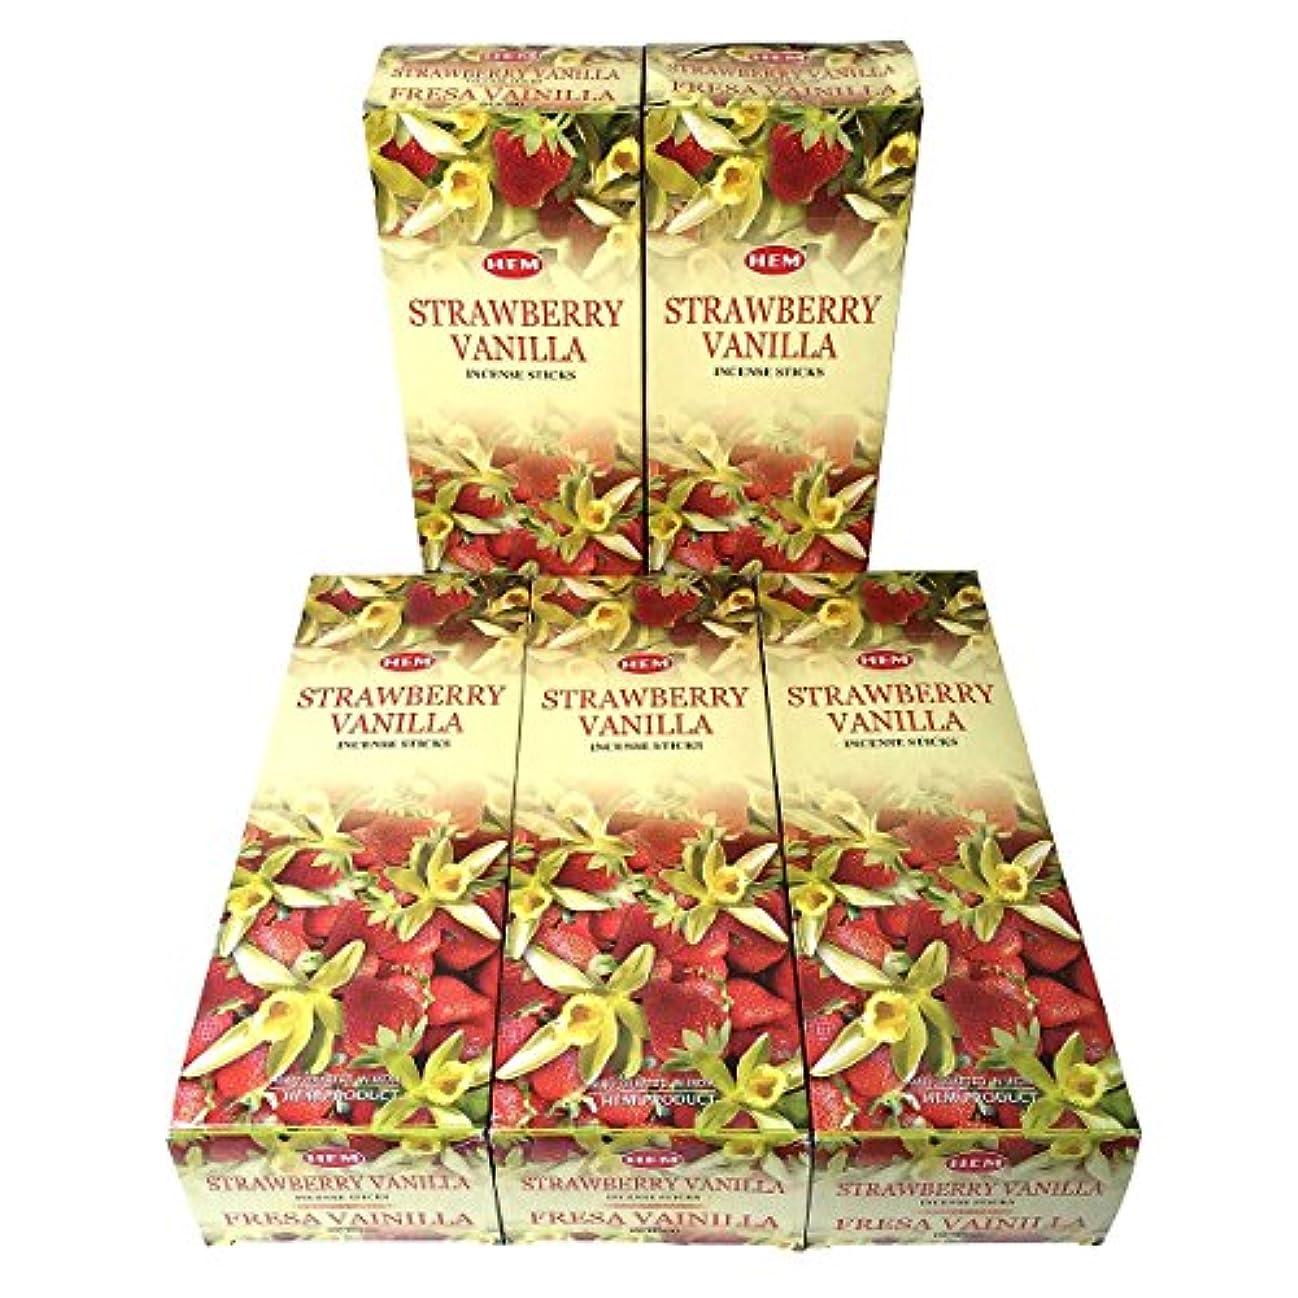 HEM ストロベリーバニラ香 スティック 5BOX(30箱)/HEM STRAWBERRY VANILLA/ インド香 / 送料無料 [並行輸入品]